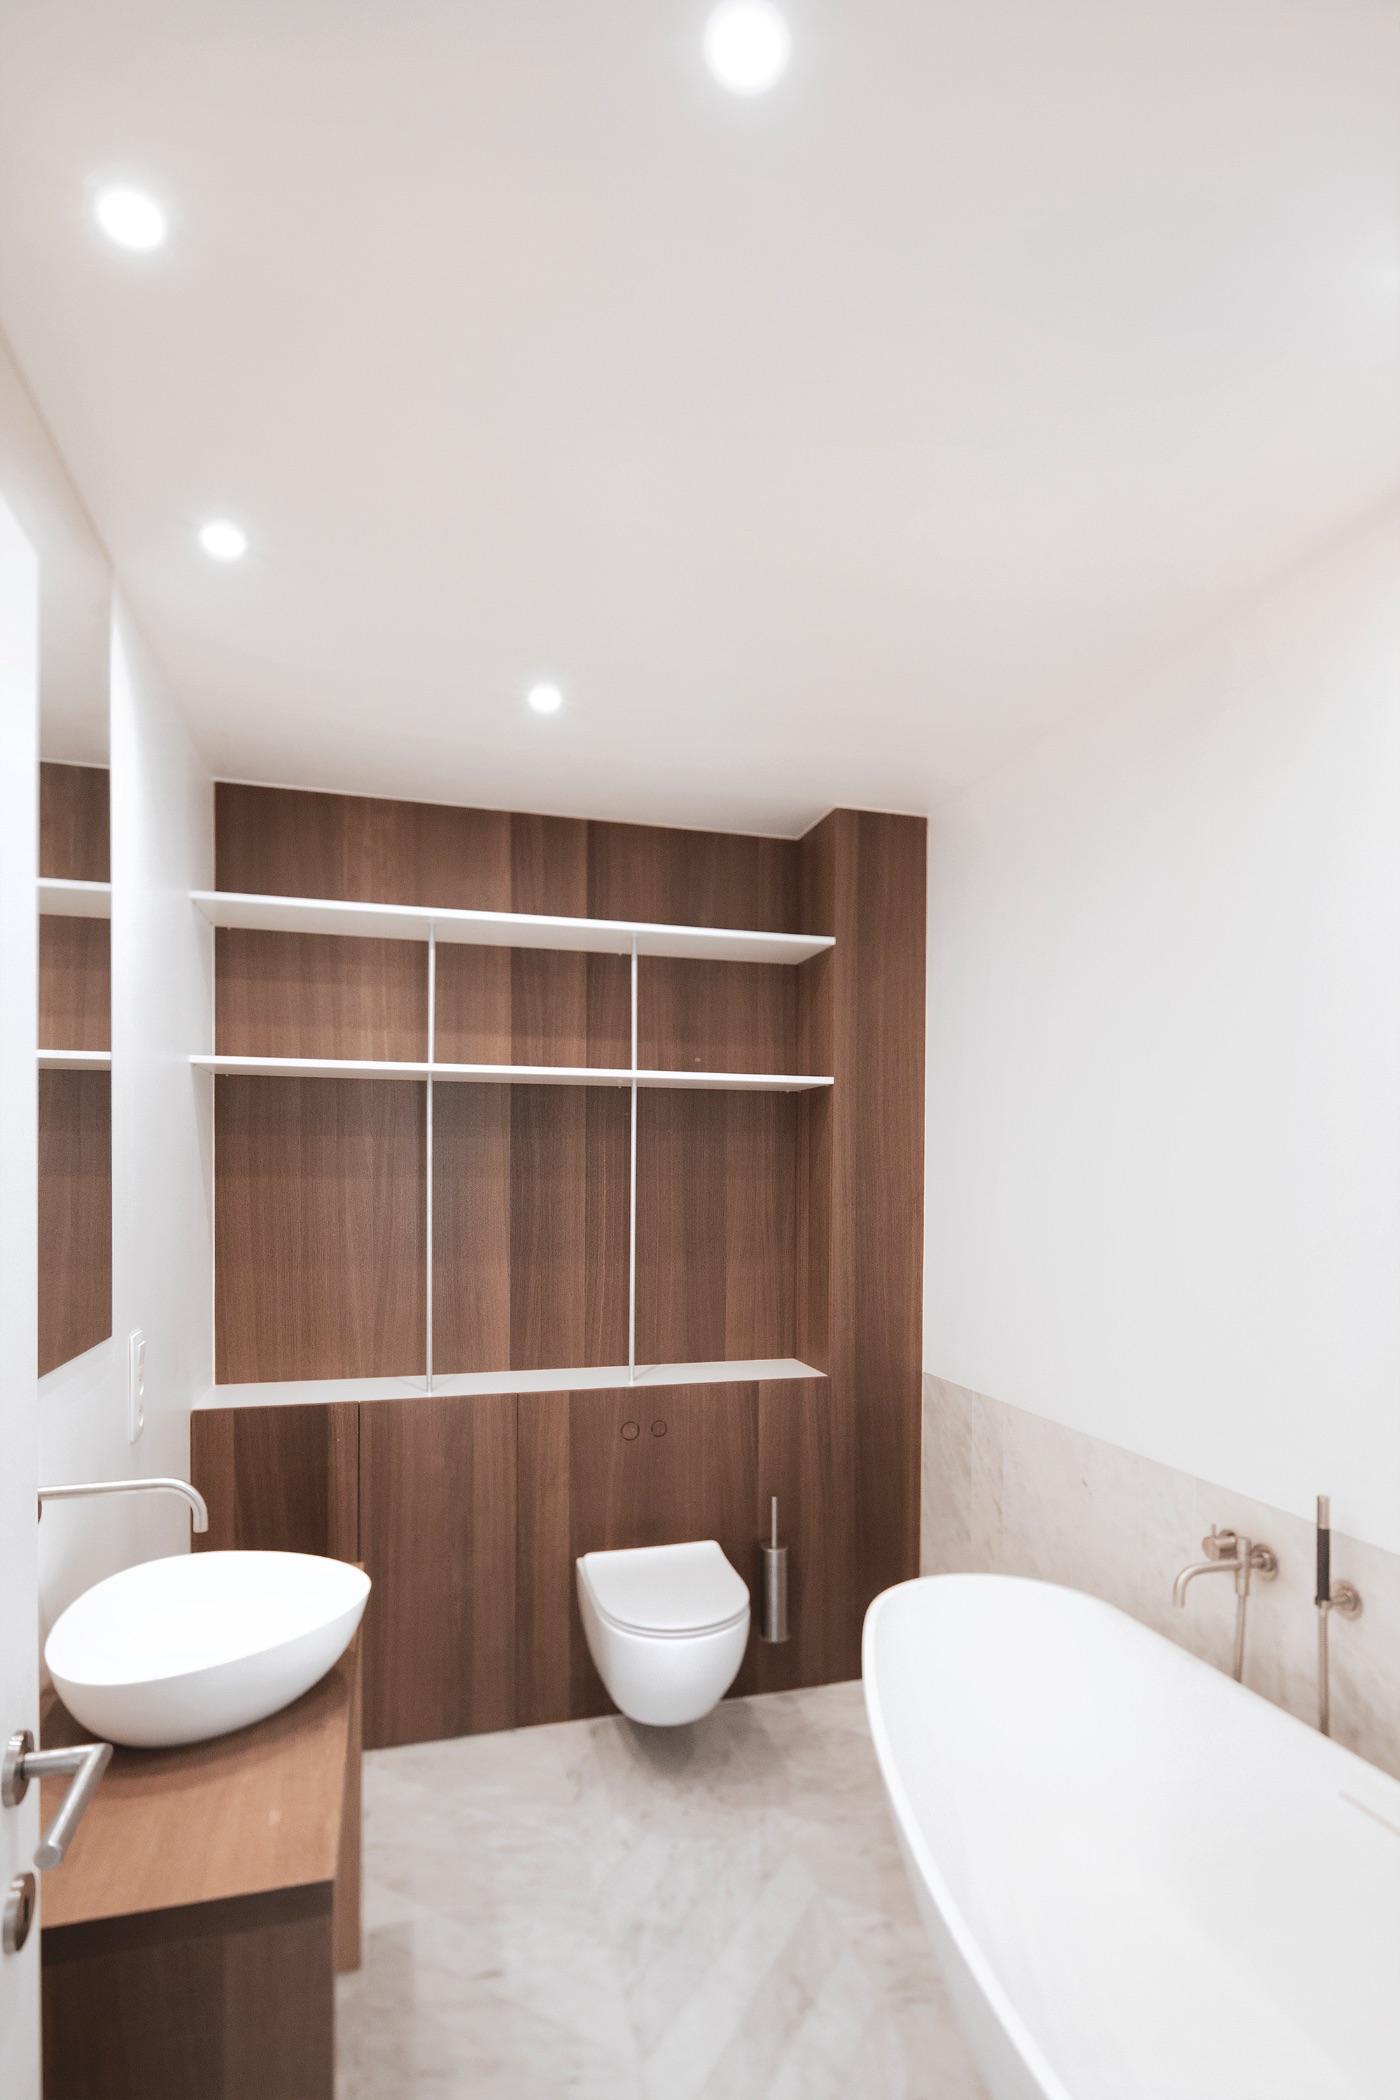 14_A&A's Apartment_Alexandru Patrichi_Inspirationist